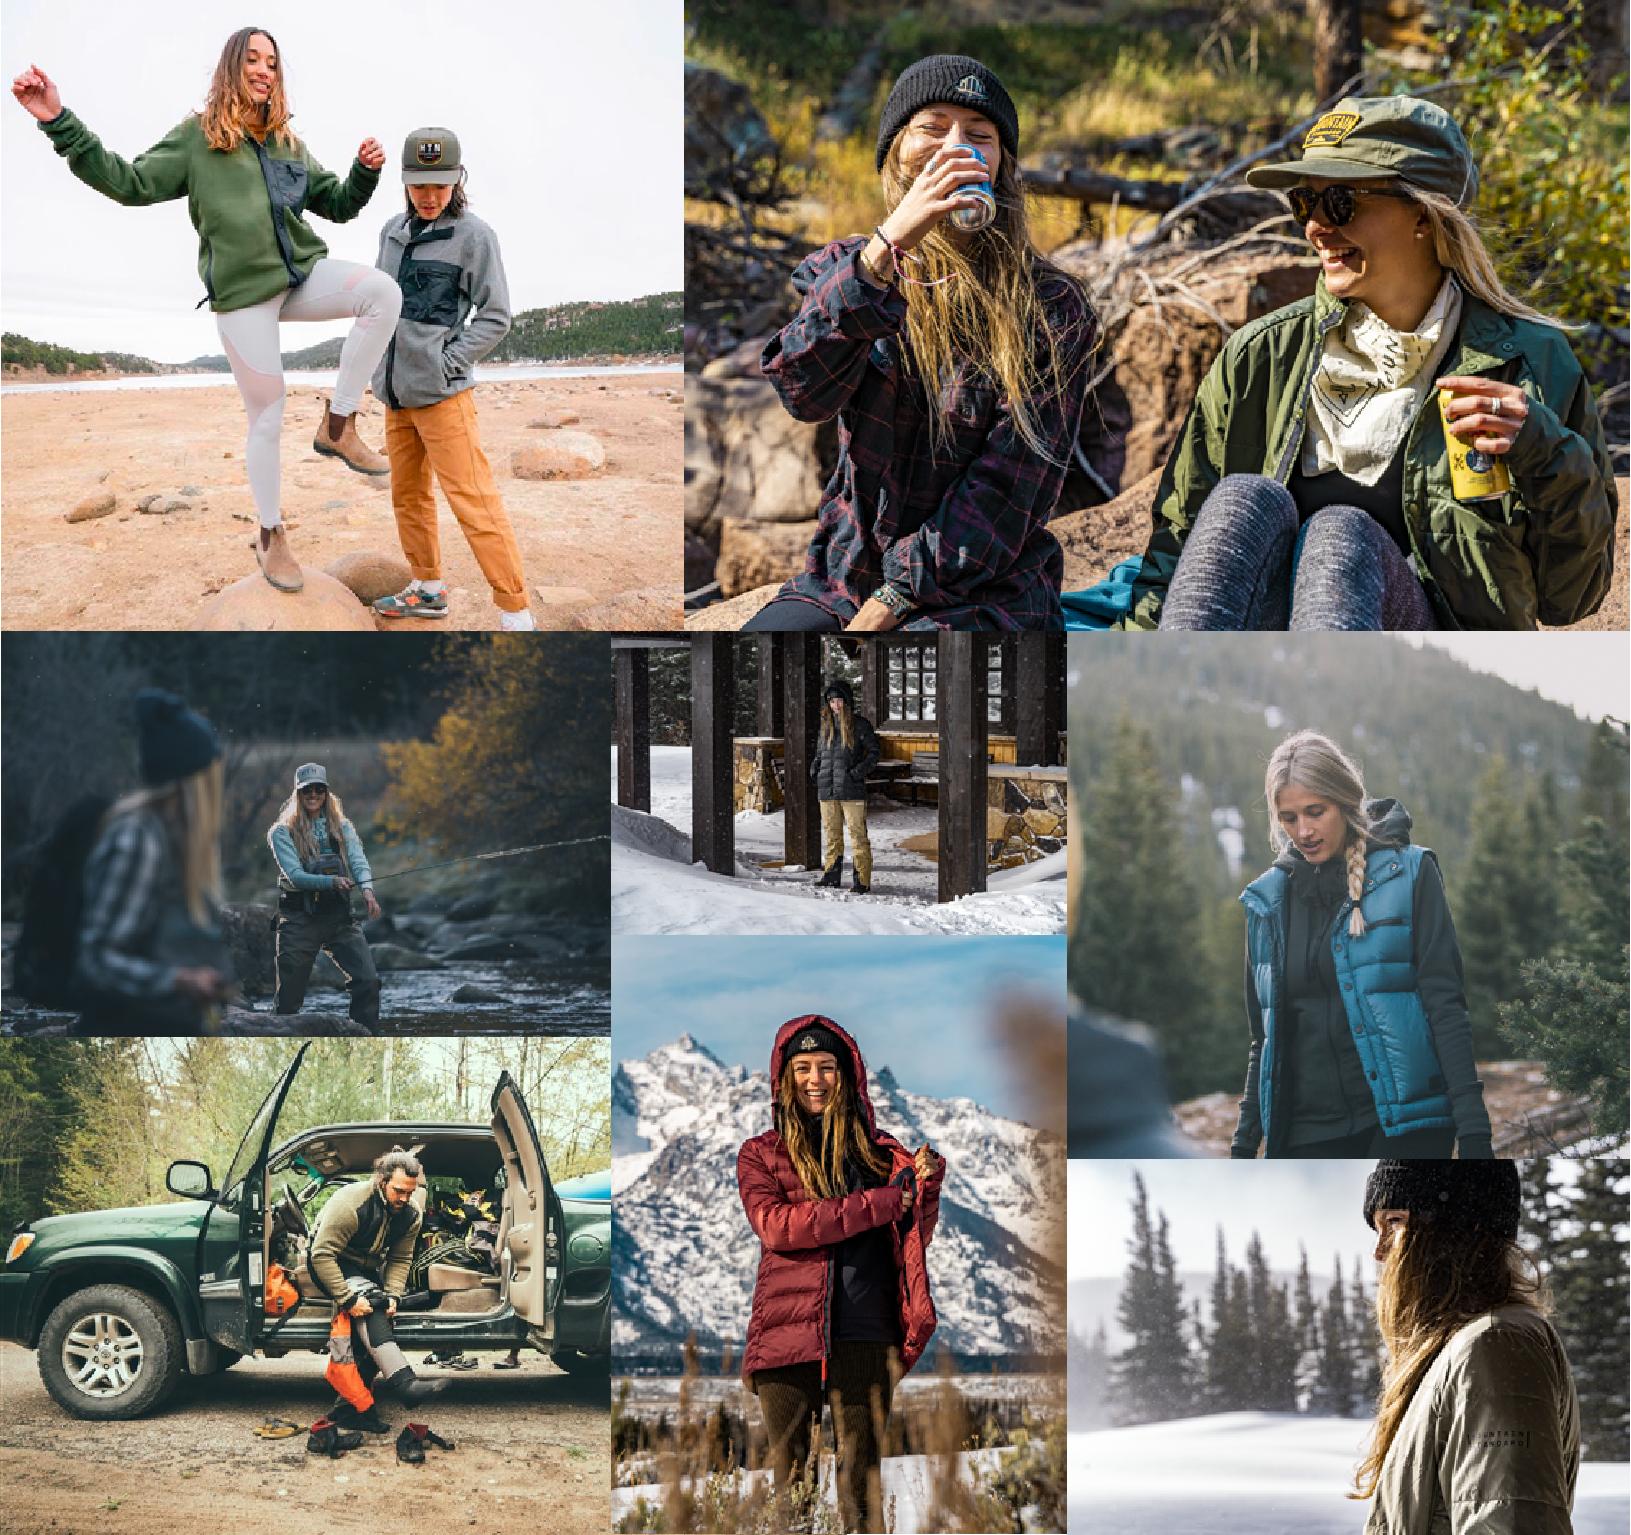 mountain standard photo collage